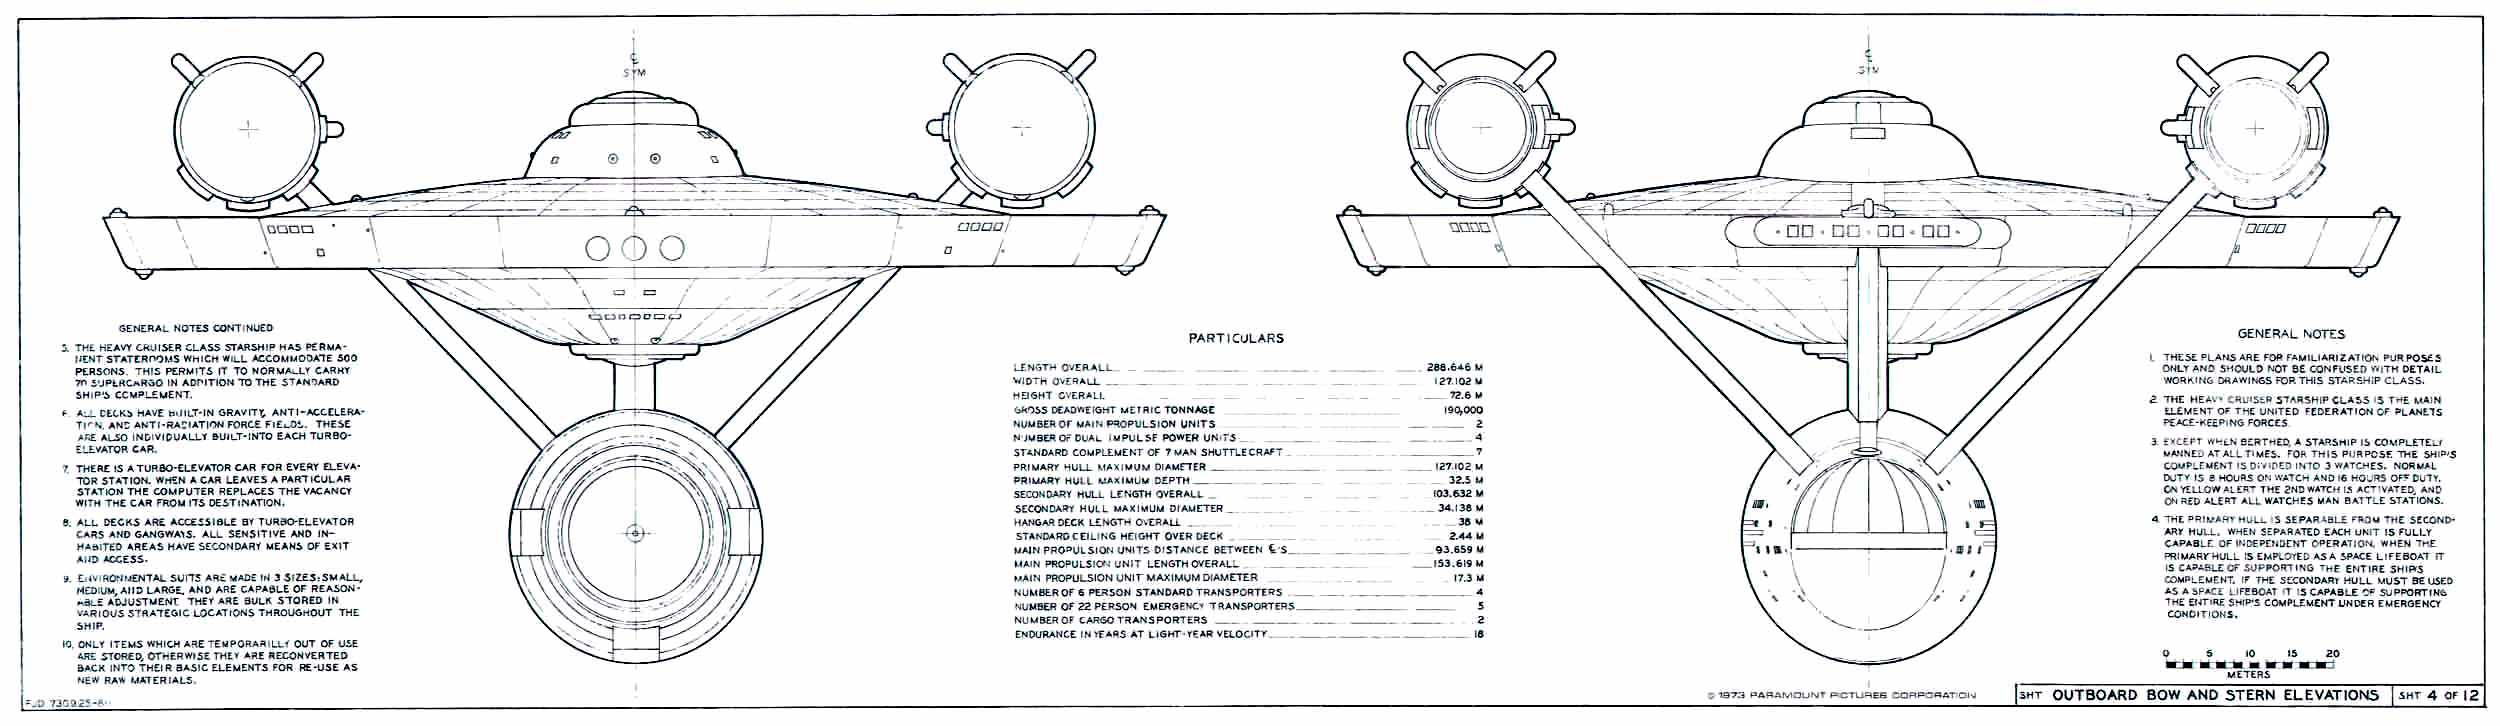 U s s enterprise vs star destroyer read description for How do i read blueprints